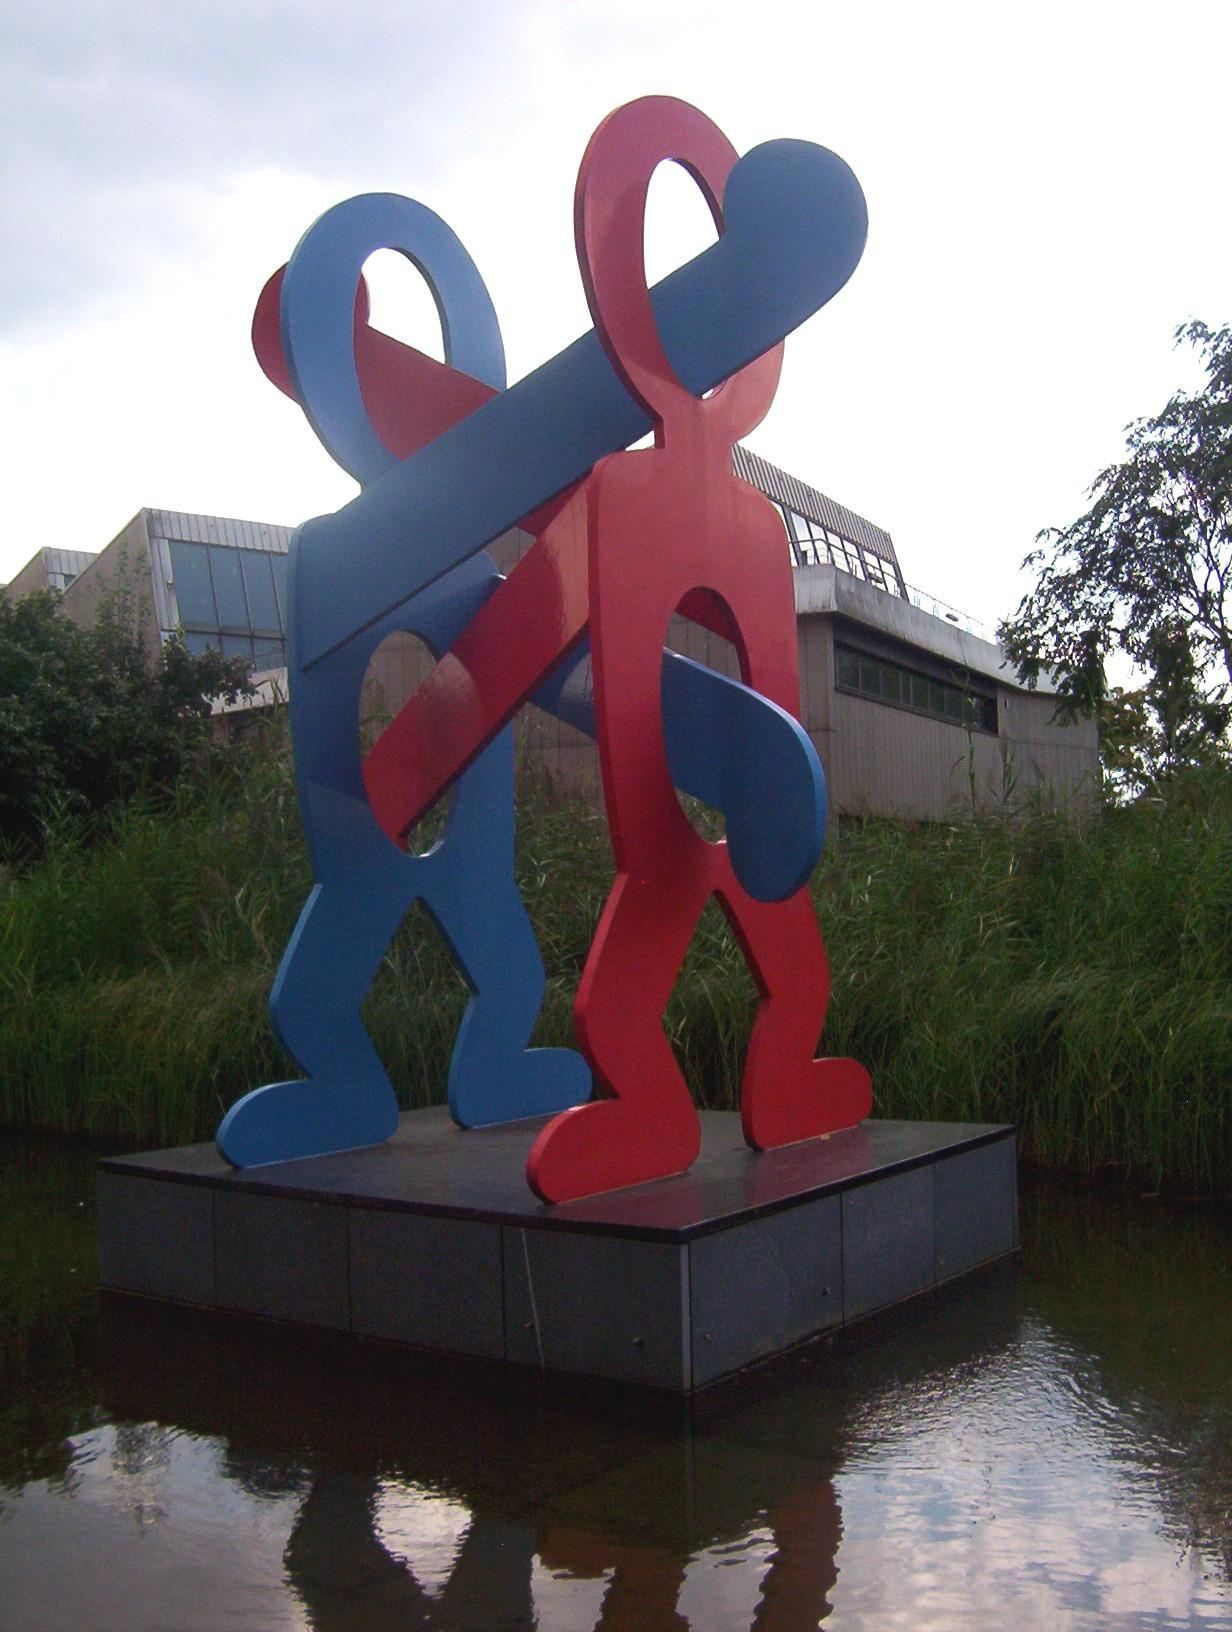 https://upload.wikimedia.org/wikipedia/commons/e/e9/Boxer_von_Keith_Haring%2C_1987%2C_Berlin.jpg